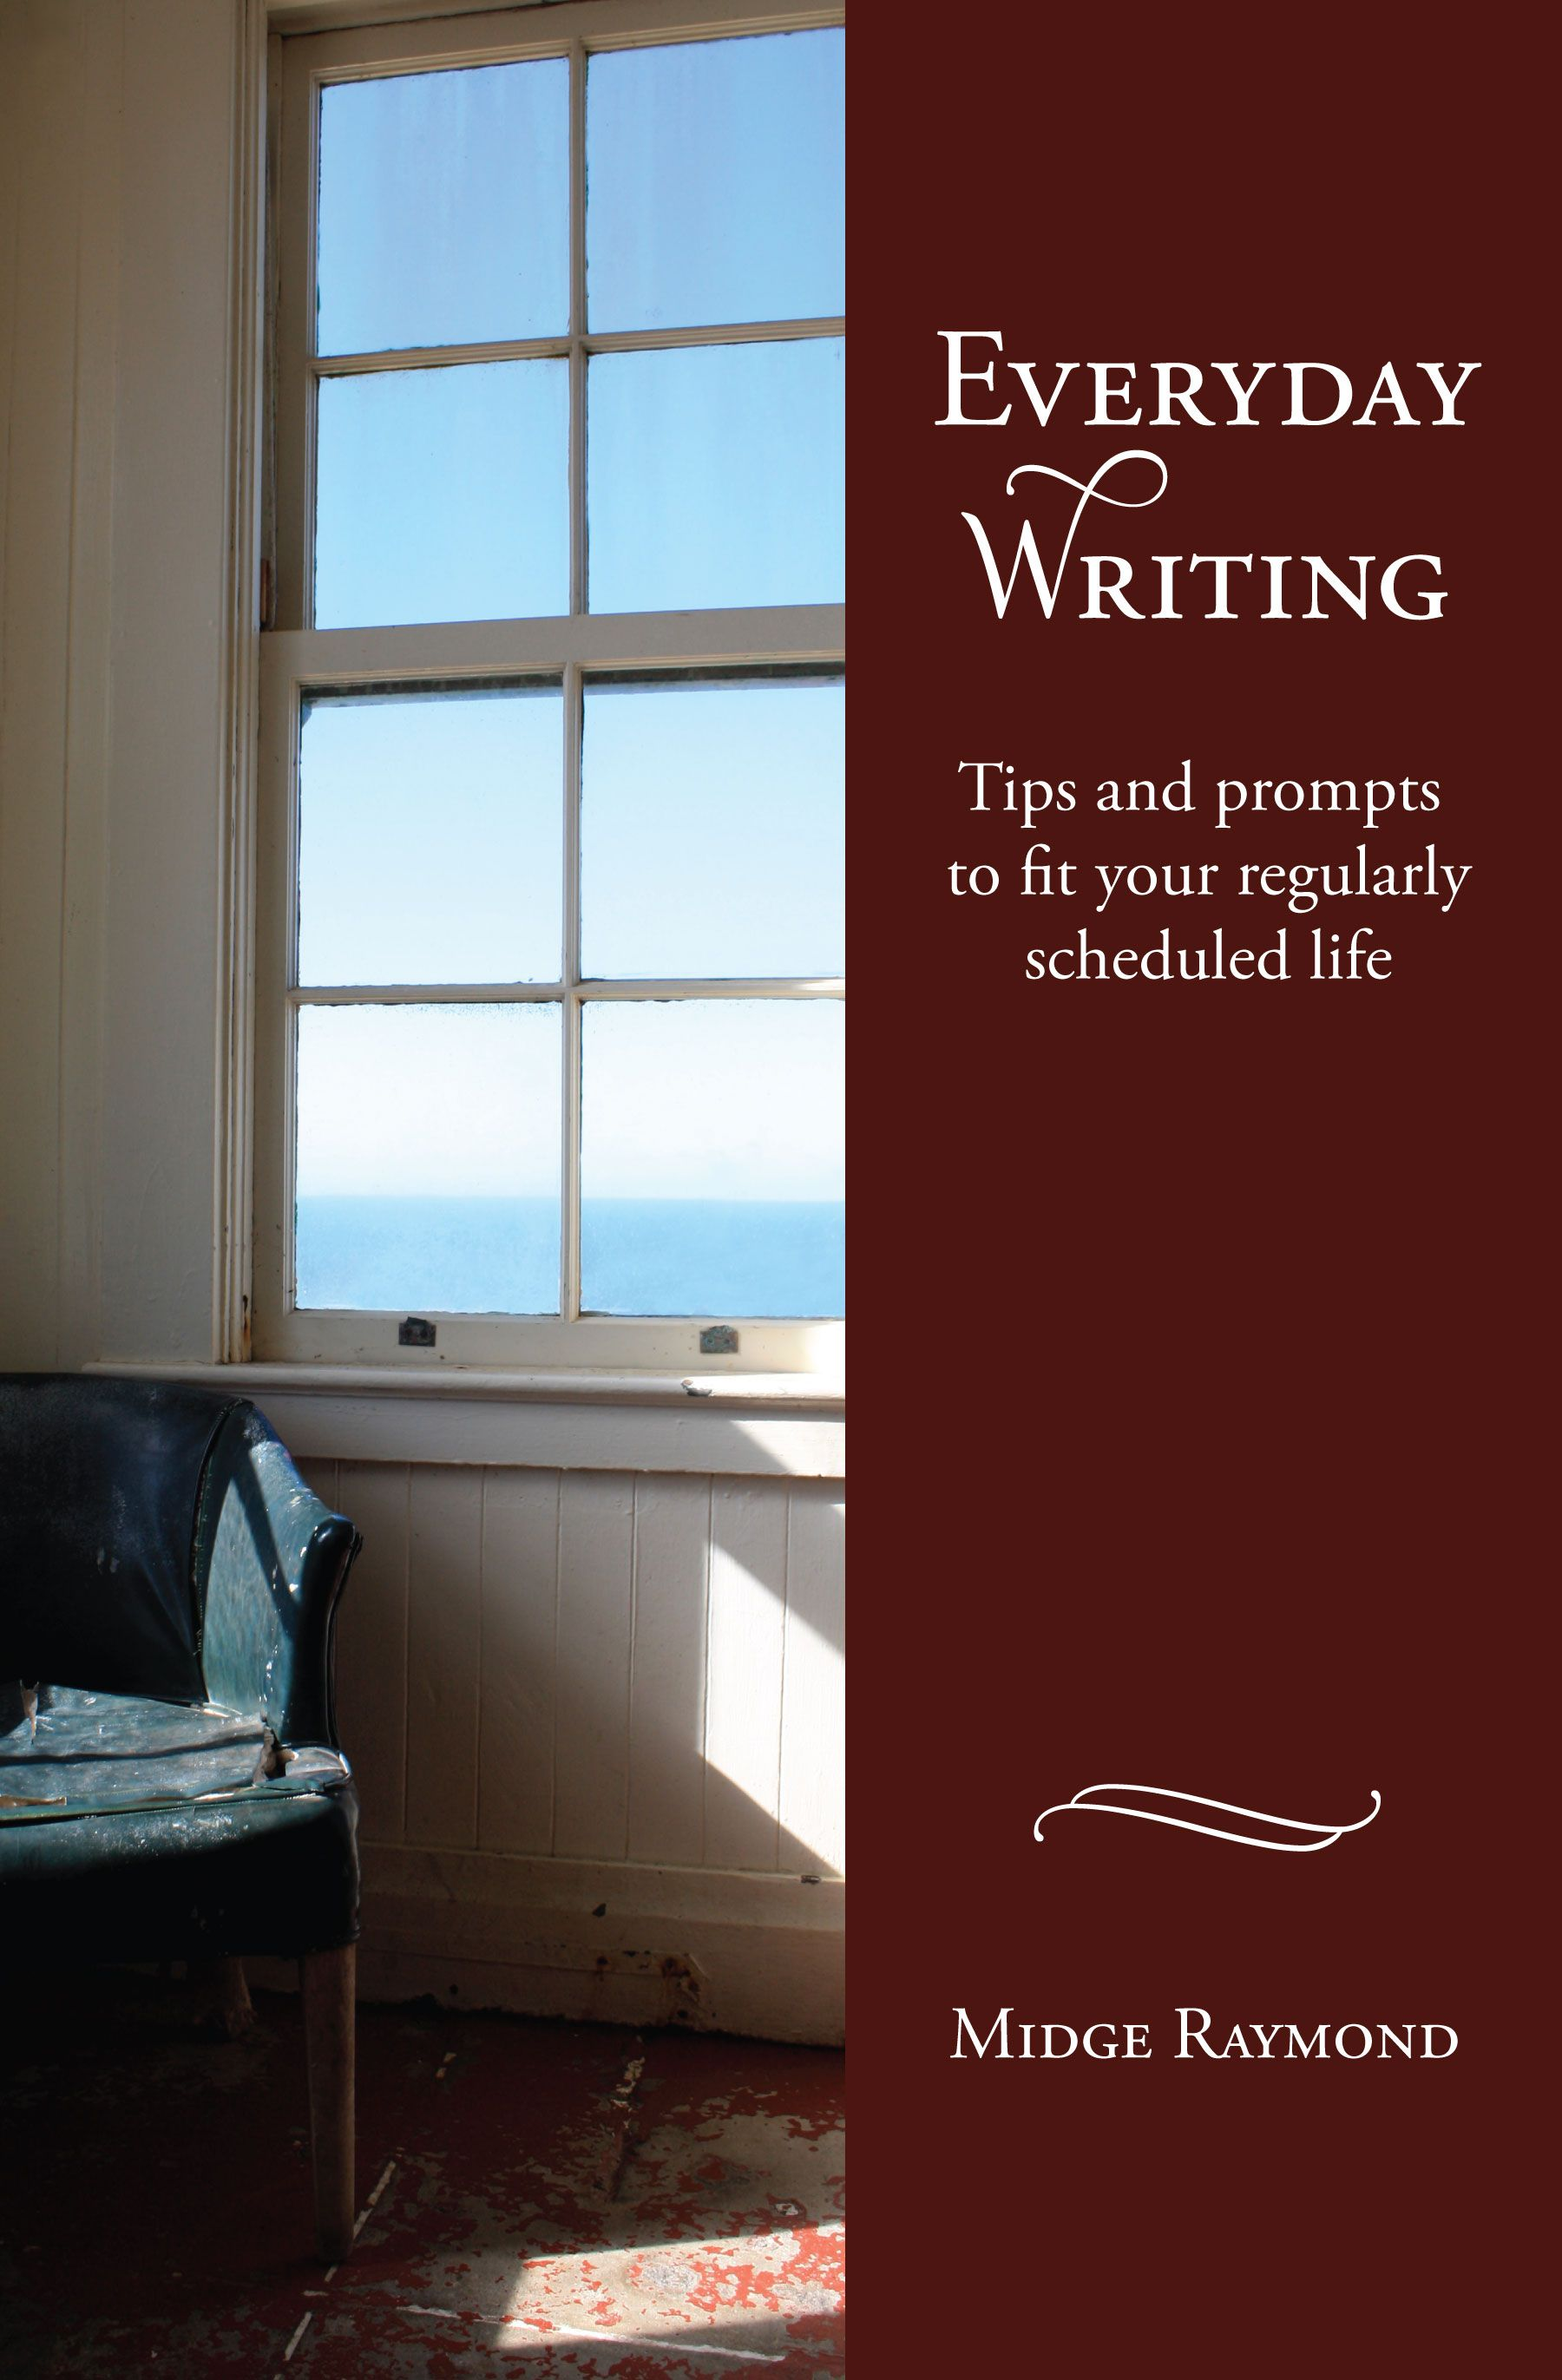 Midge Raymond On Everyday Writing